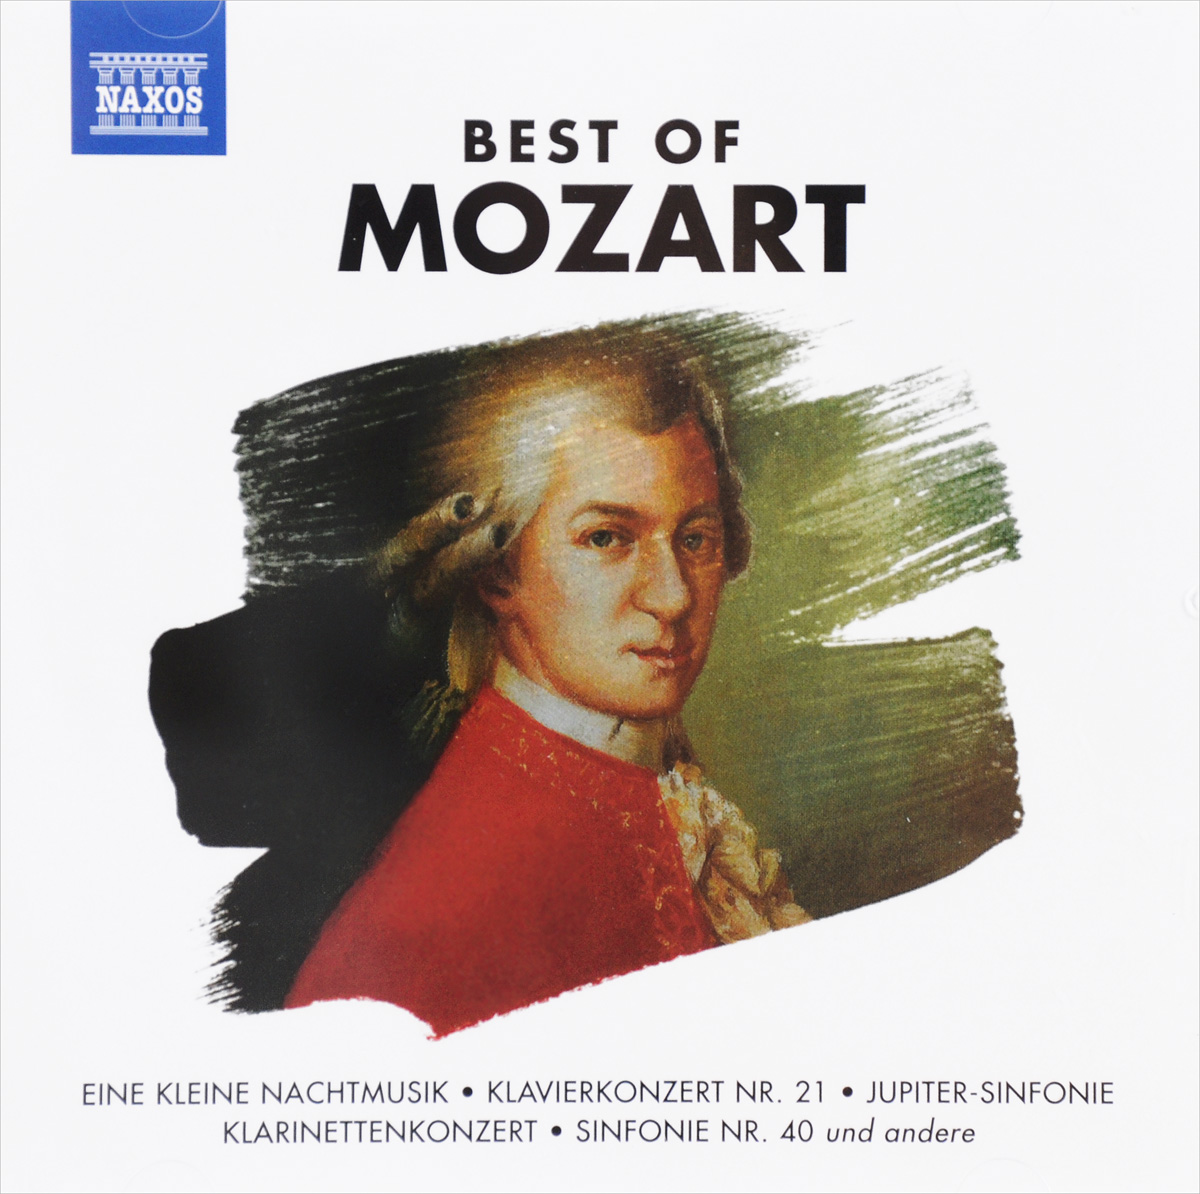 Capella Istropolitana,Йоханнес Вайлднер,Бэрри Вордсвут,Eder Quartet,Ричард Эдлингер Best Of Mozart